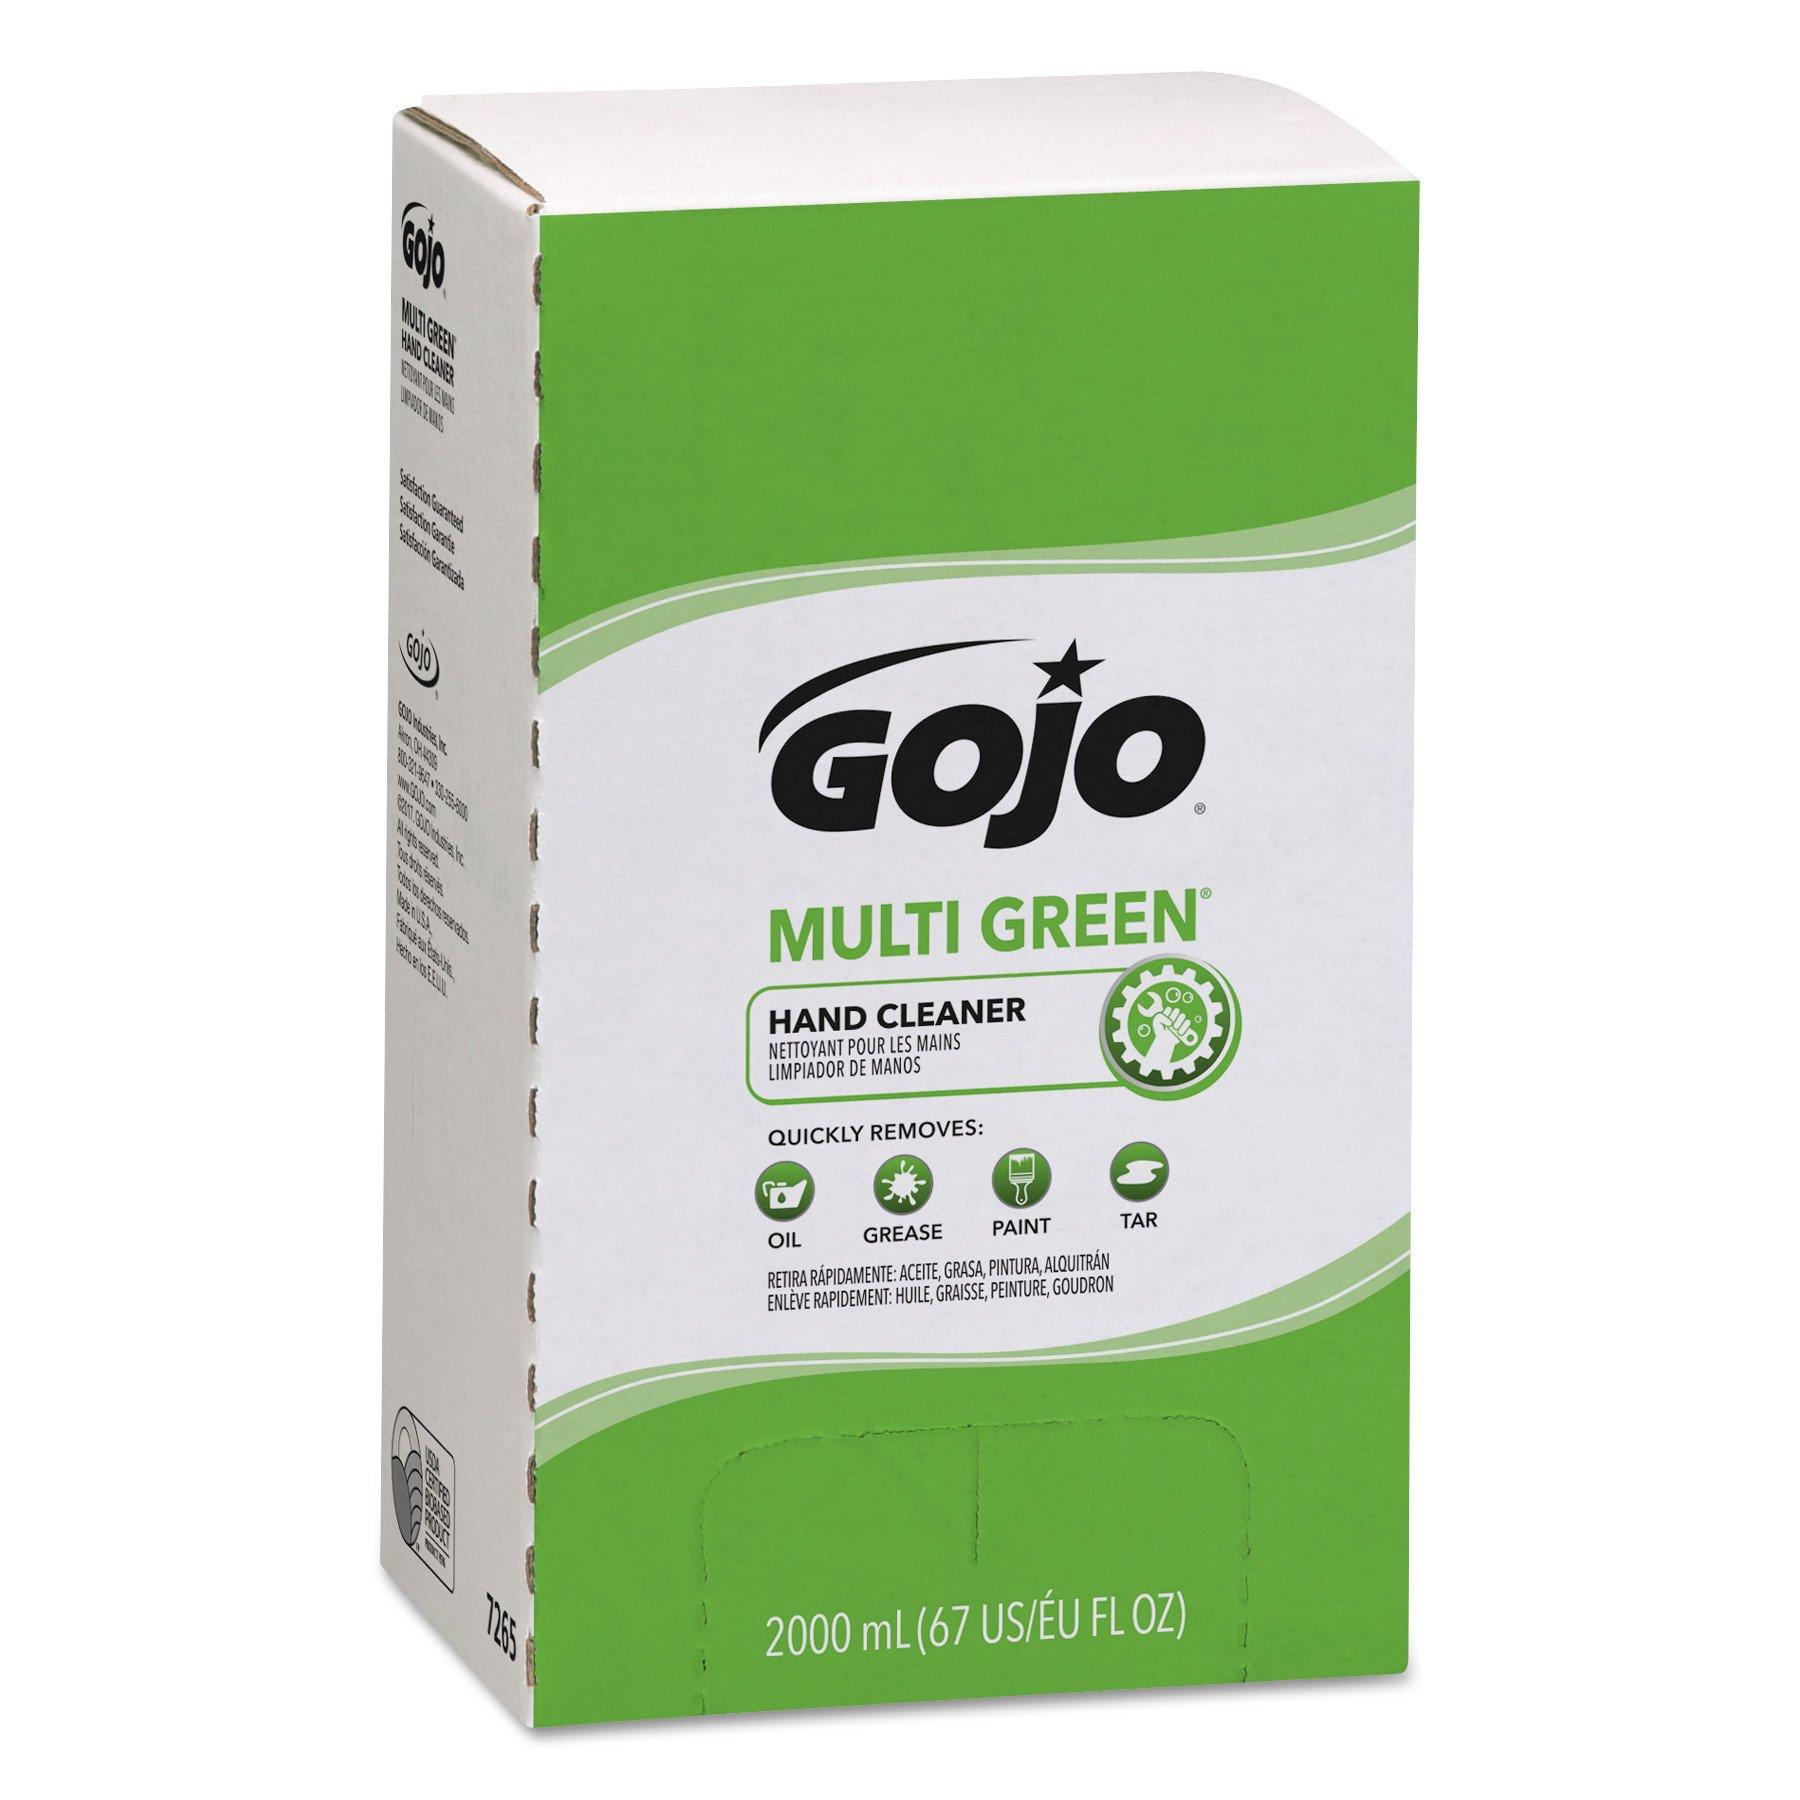 GOJO 7265 MULTI GREEN Hand Cleaner Refill, 2000mL, Citrus Scent, Green (Case of 4)